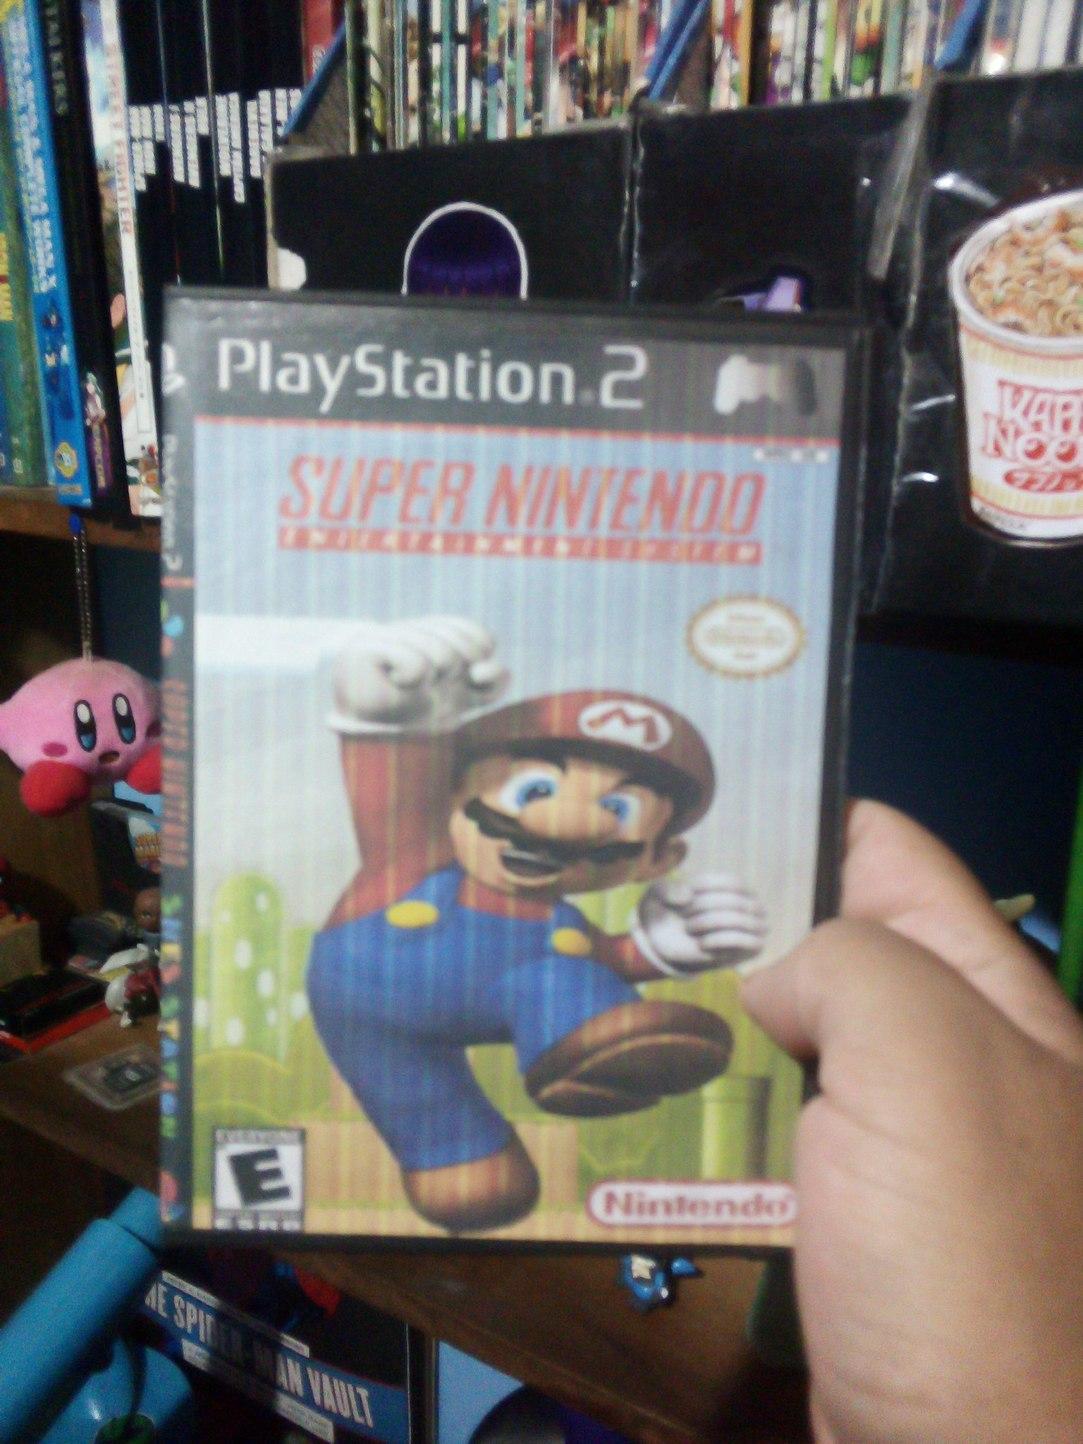 Por esta cosa me encanta la Super Nintendo - meme